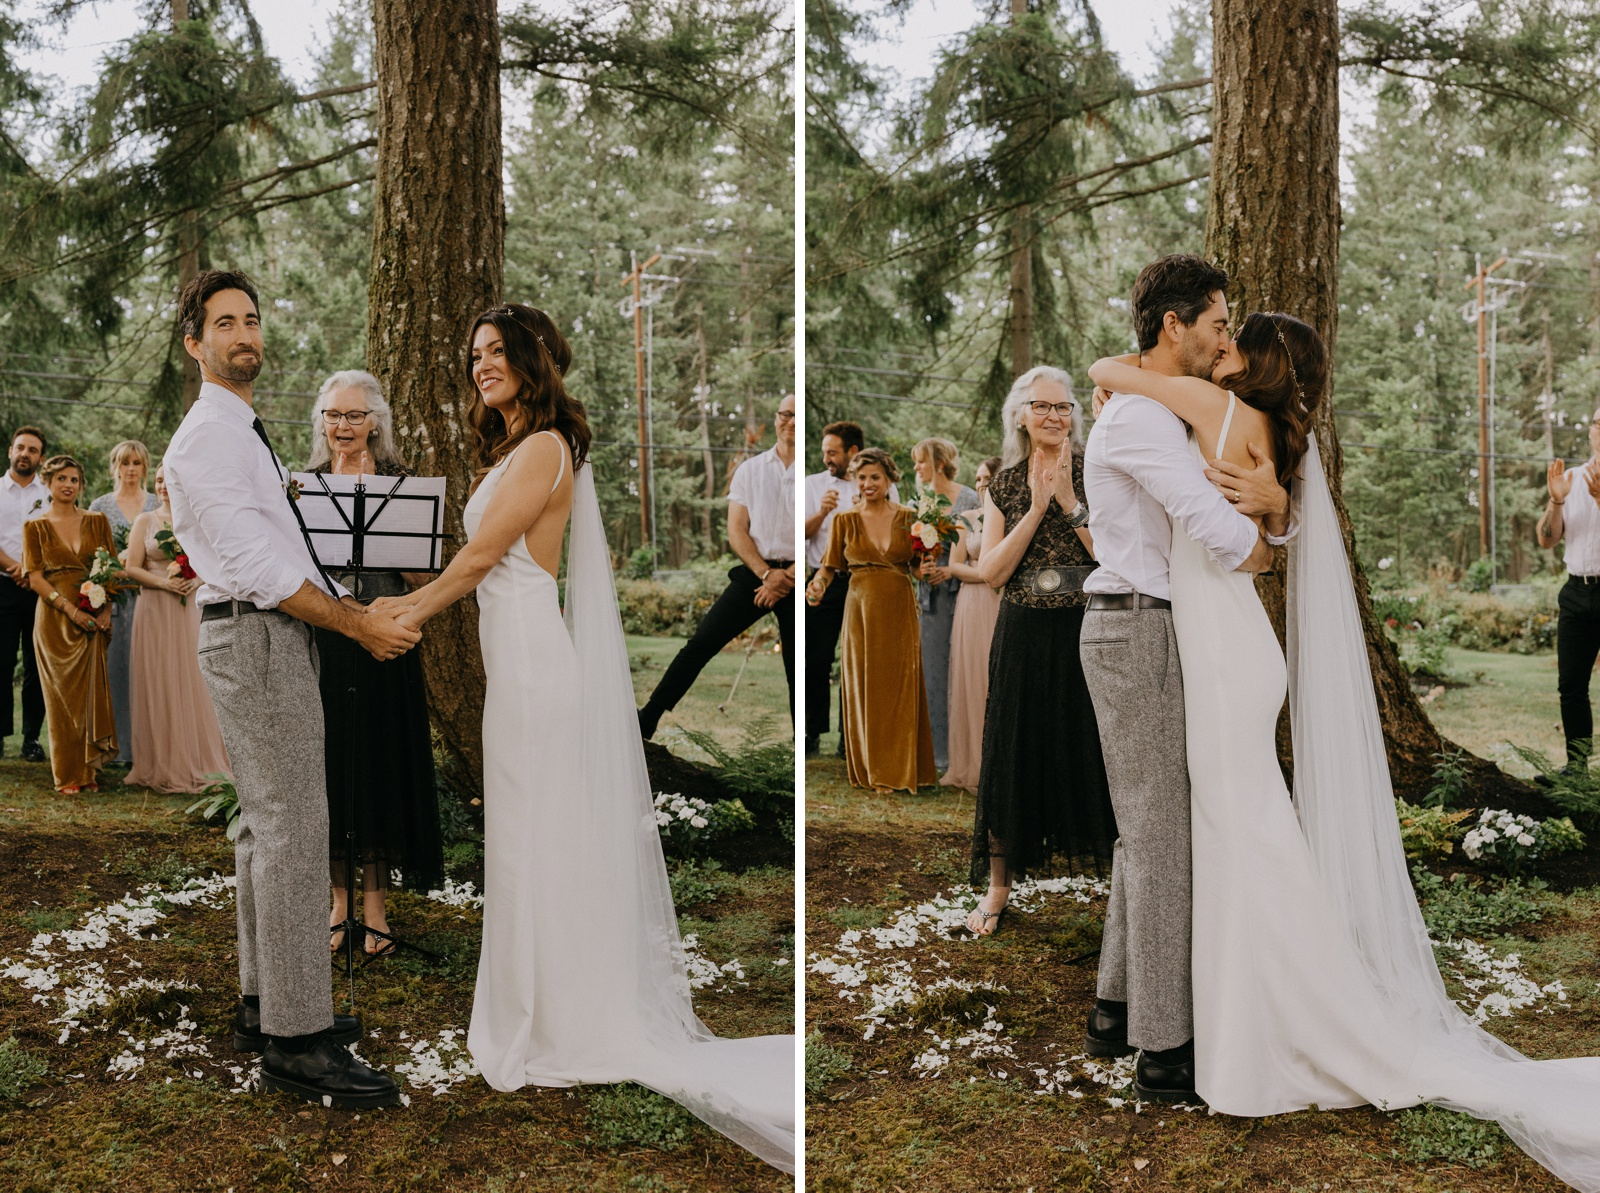 Matthew and Autumn Intimate Outdoor Backyard Wedding_0156